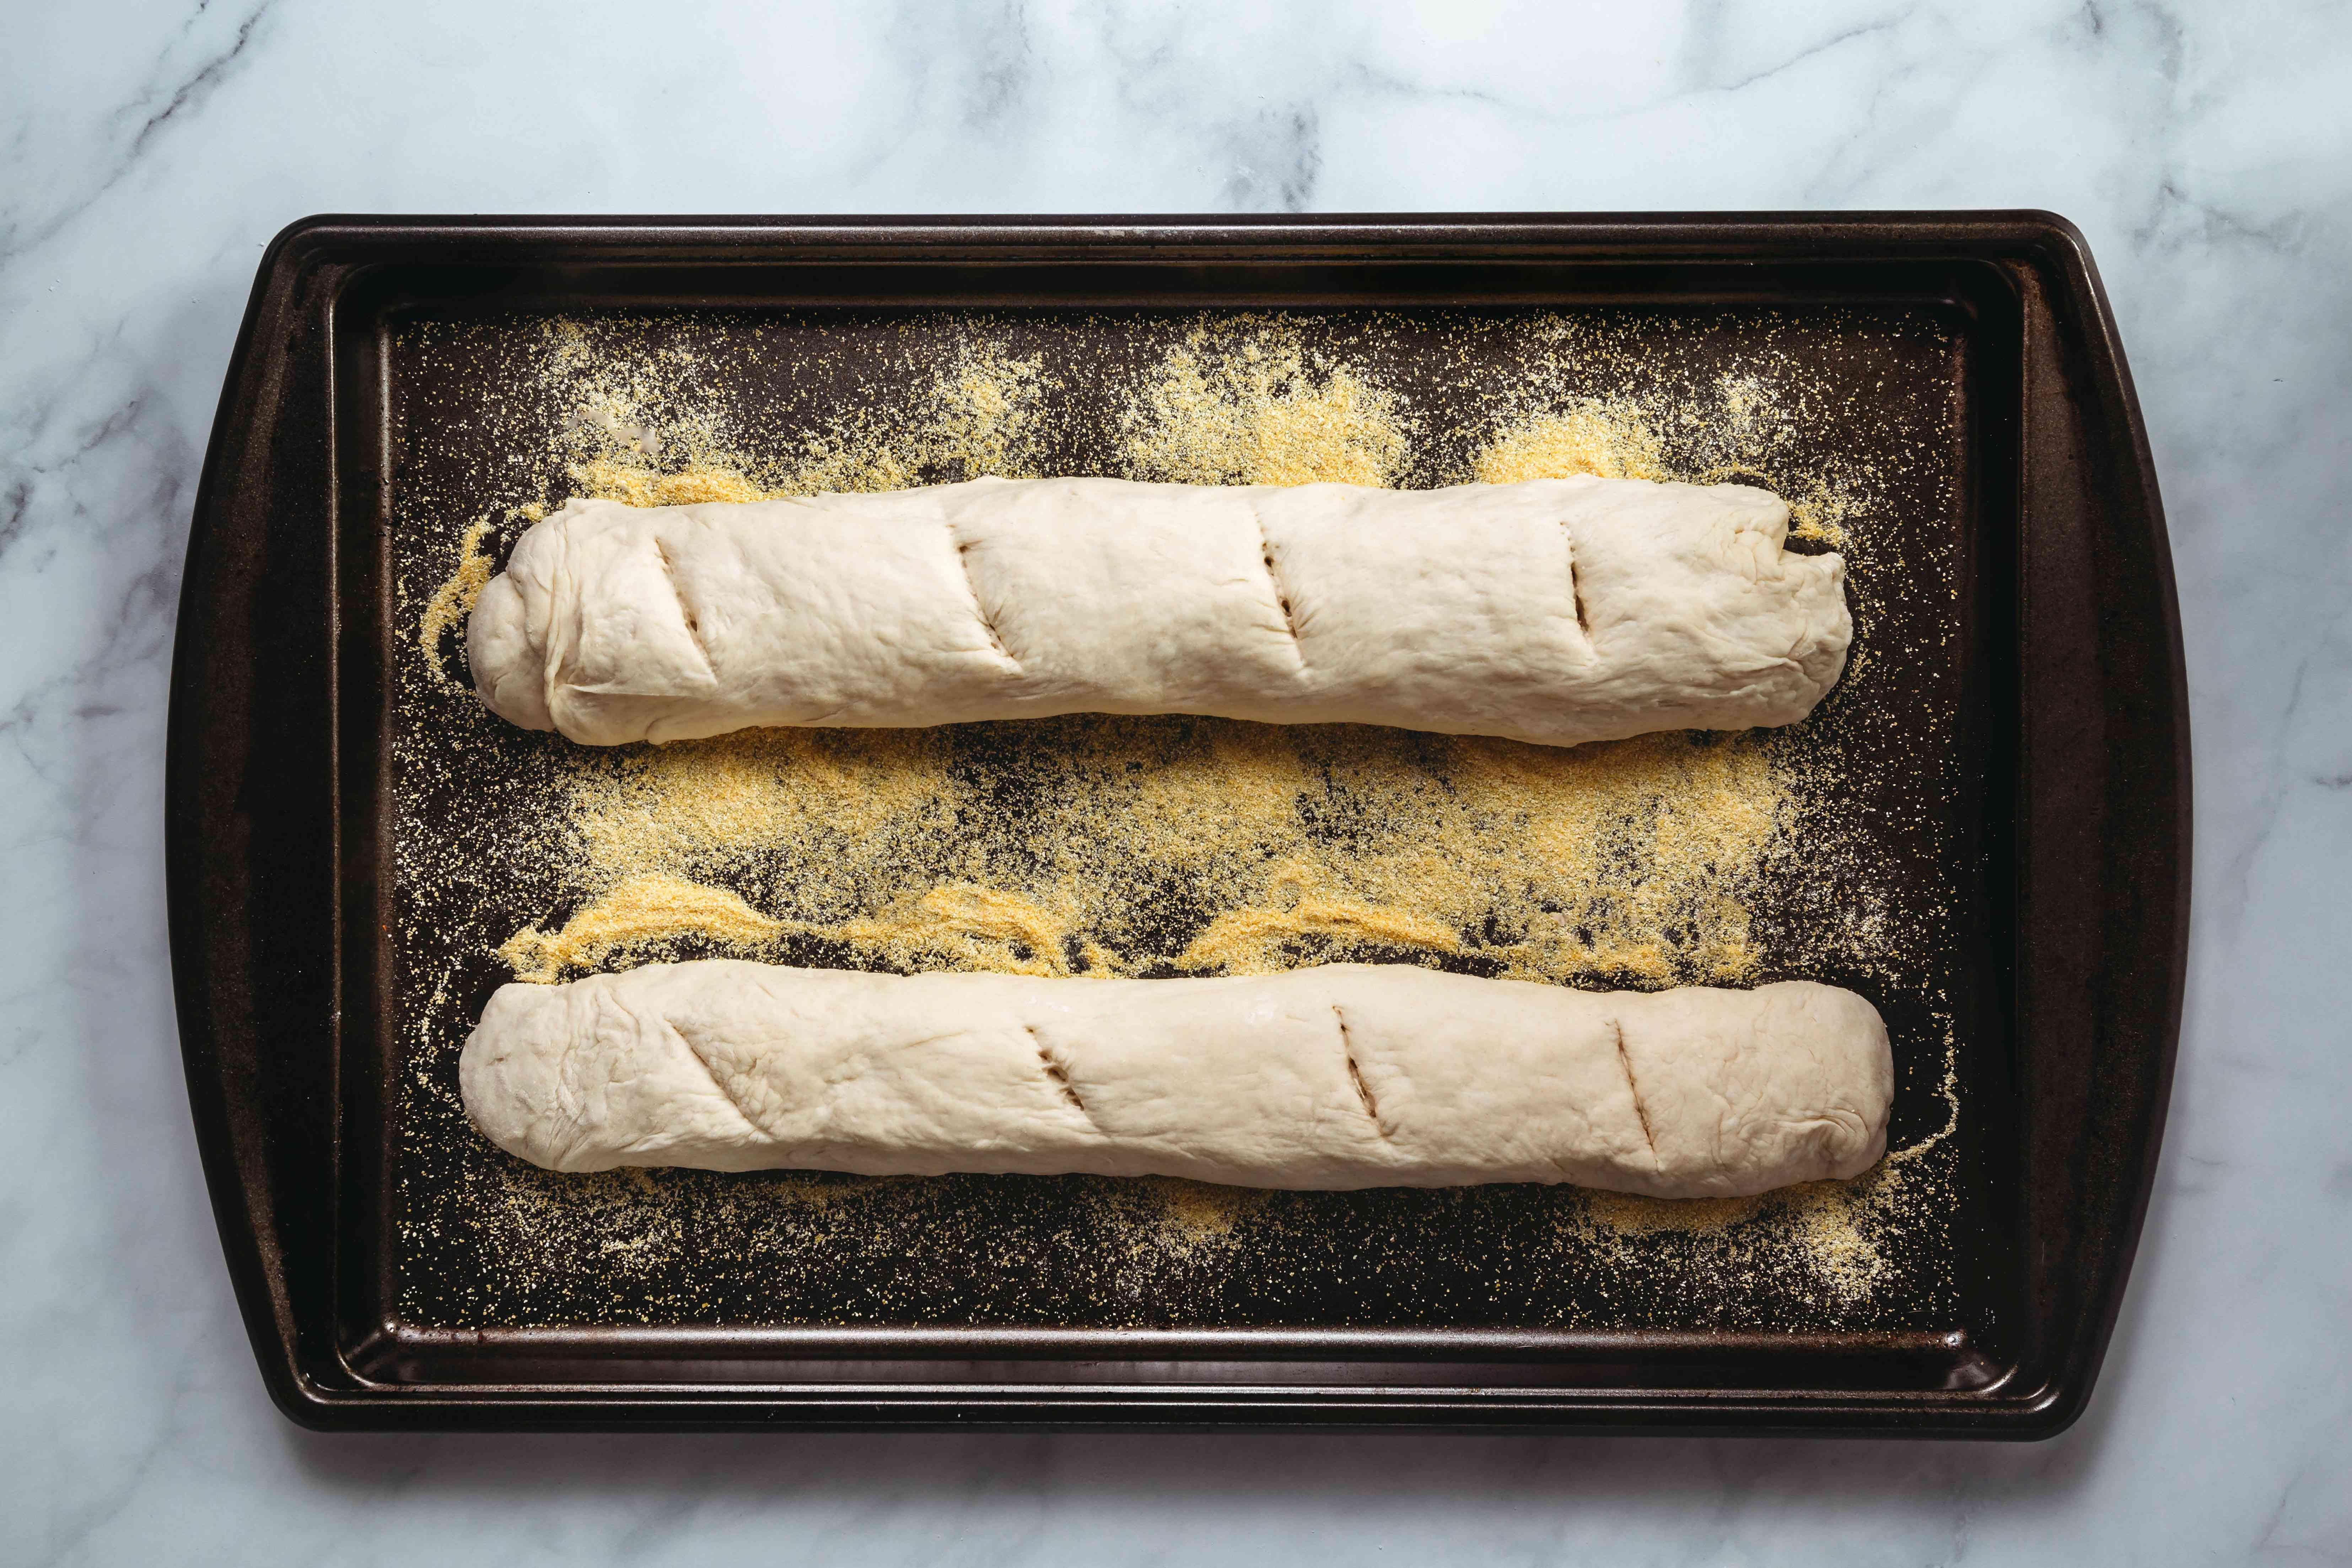 Bread dough on a baking sheet with cornmeal